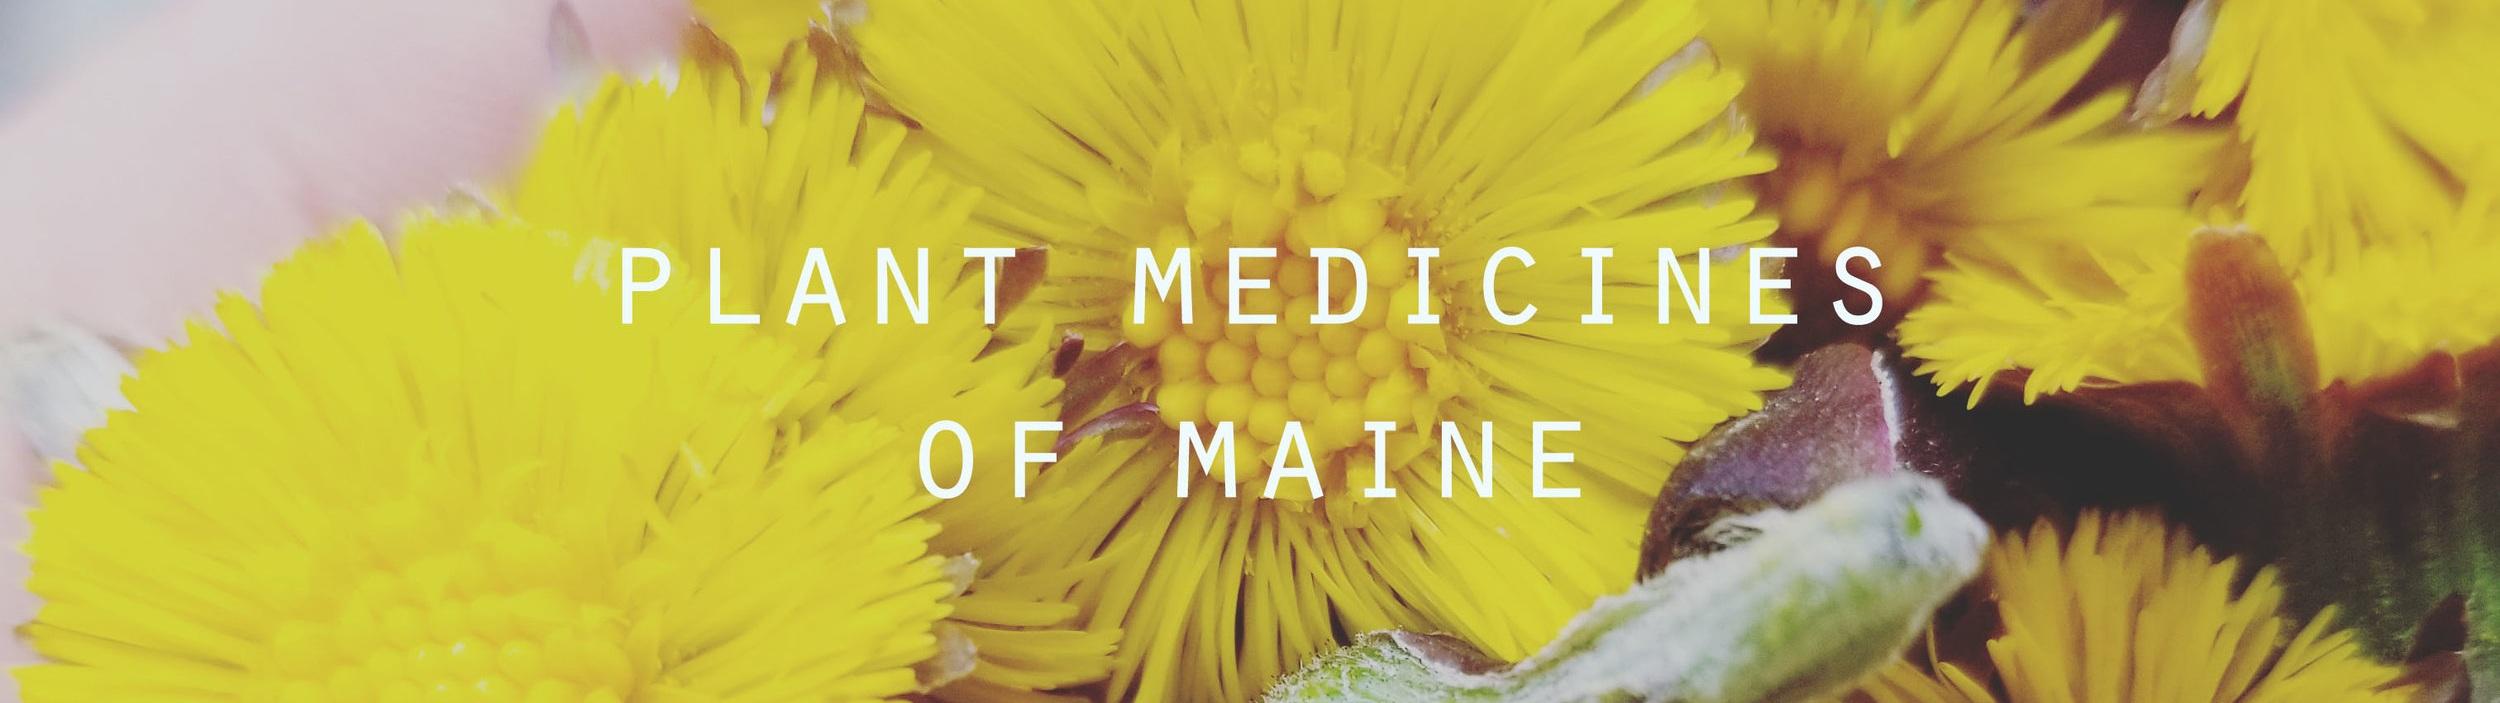 plant+medicines.jpg